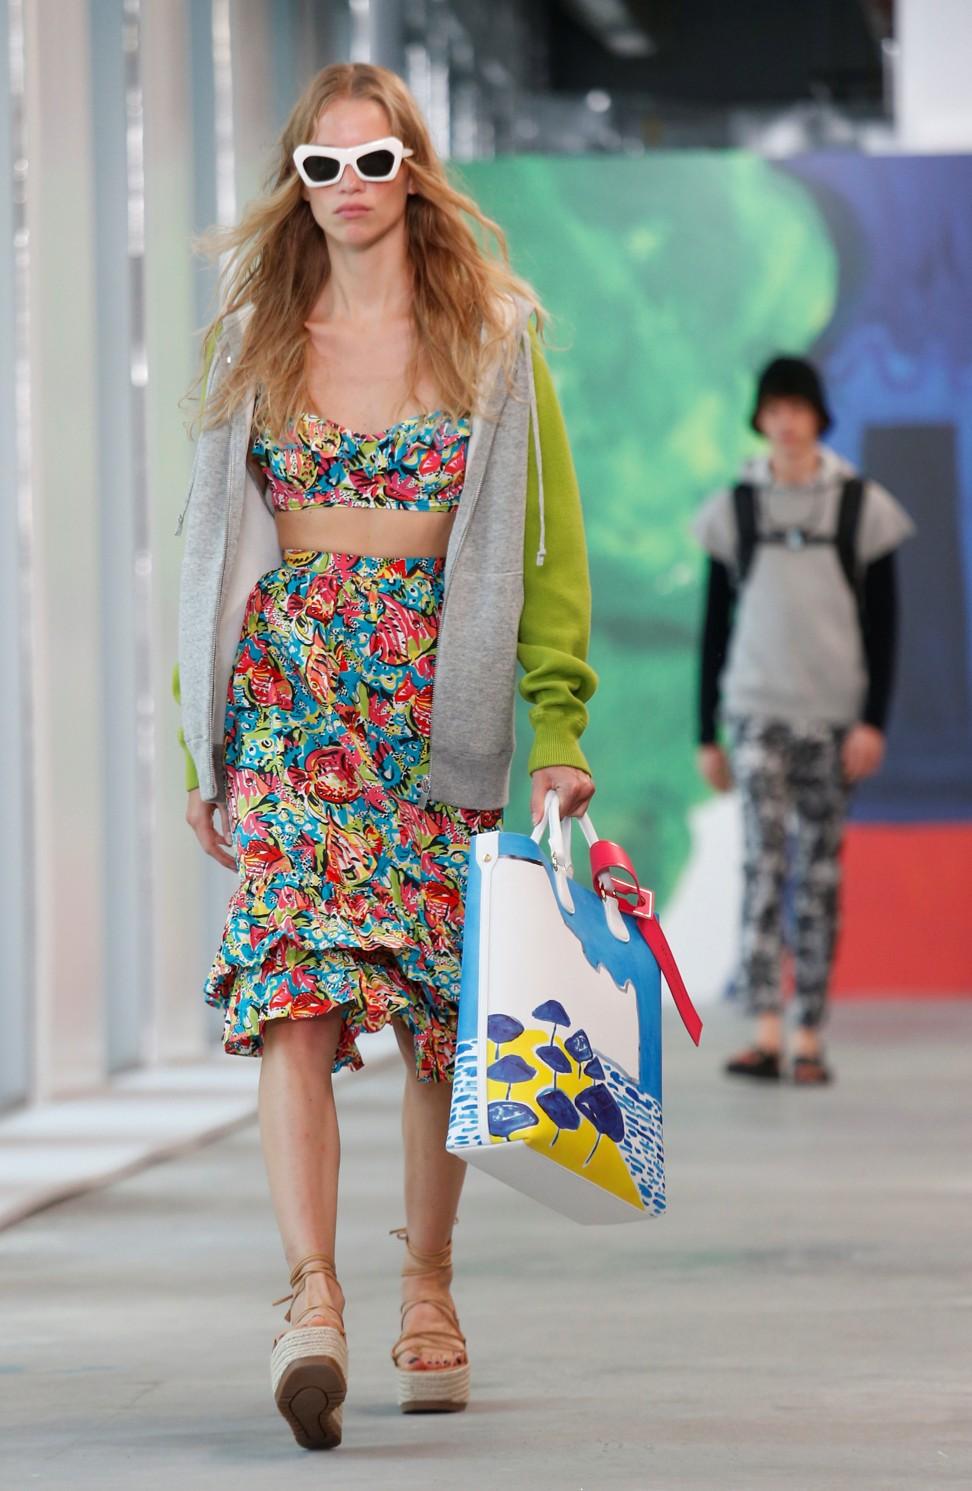 69370c886f1 10 top  takeaways  from New York Fashion Week